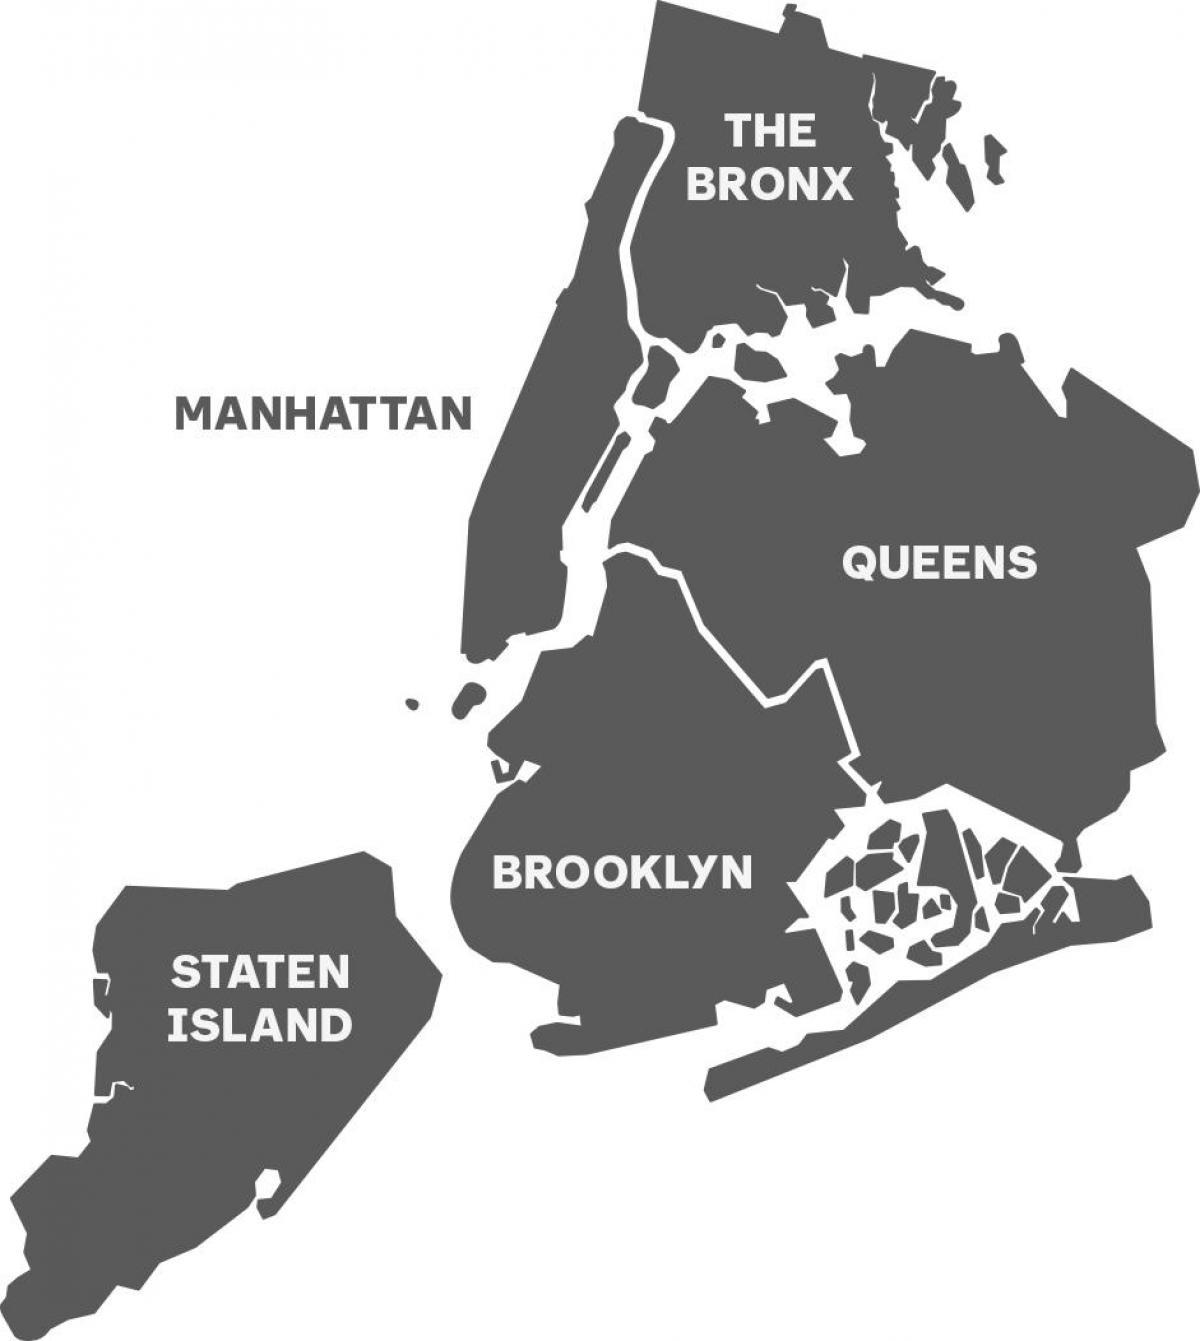 offline térkép New York offline térkép   New York vázlatos térkép (New York   USA) offline térkép